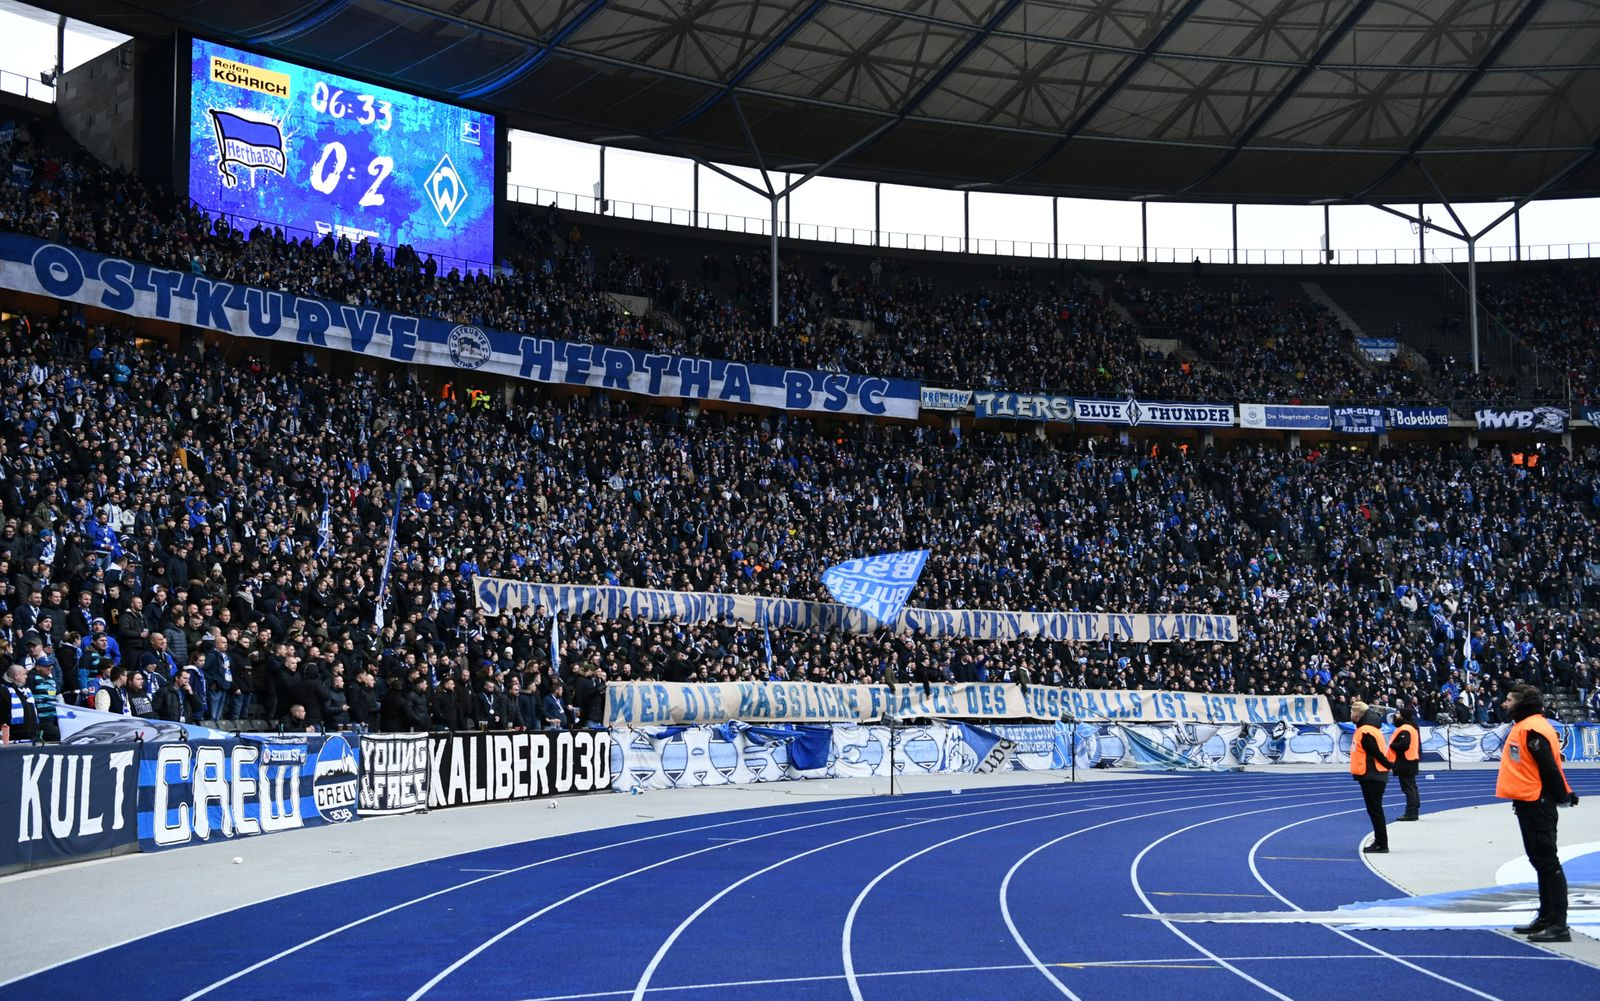 Bundesliga - Hertha BSC v Werder Bremen